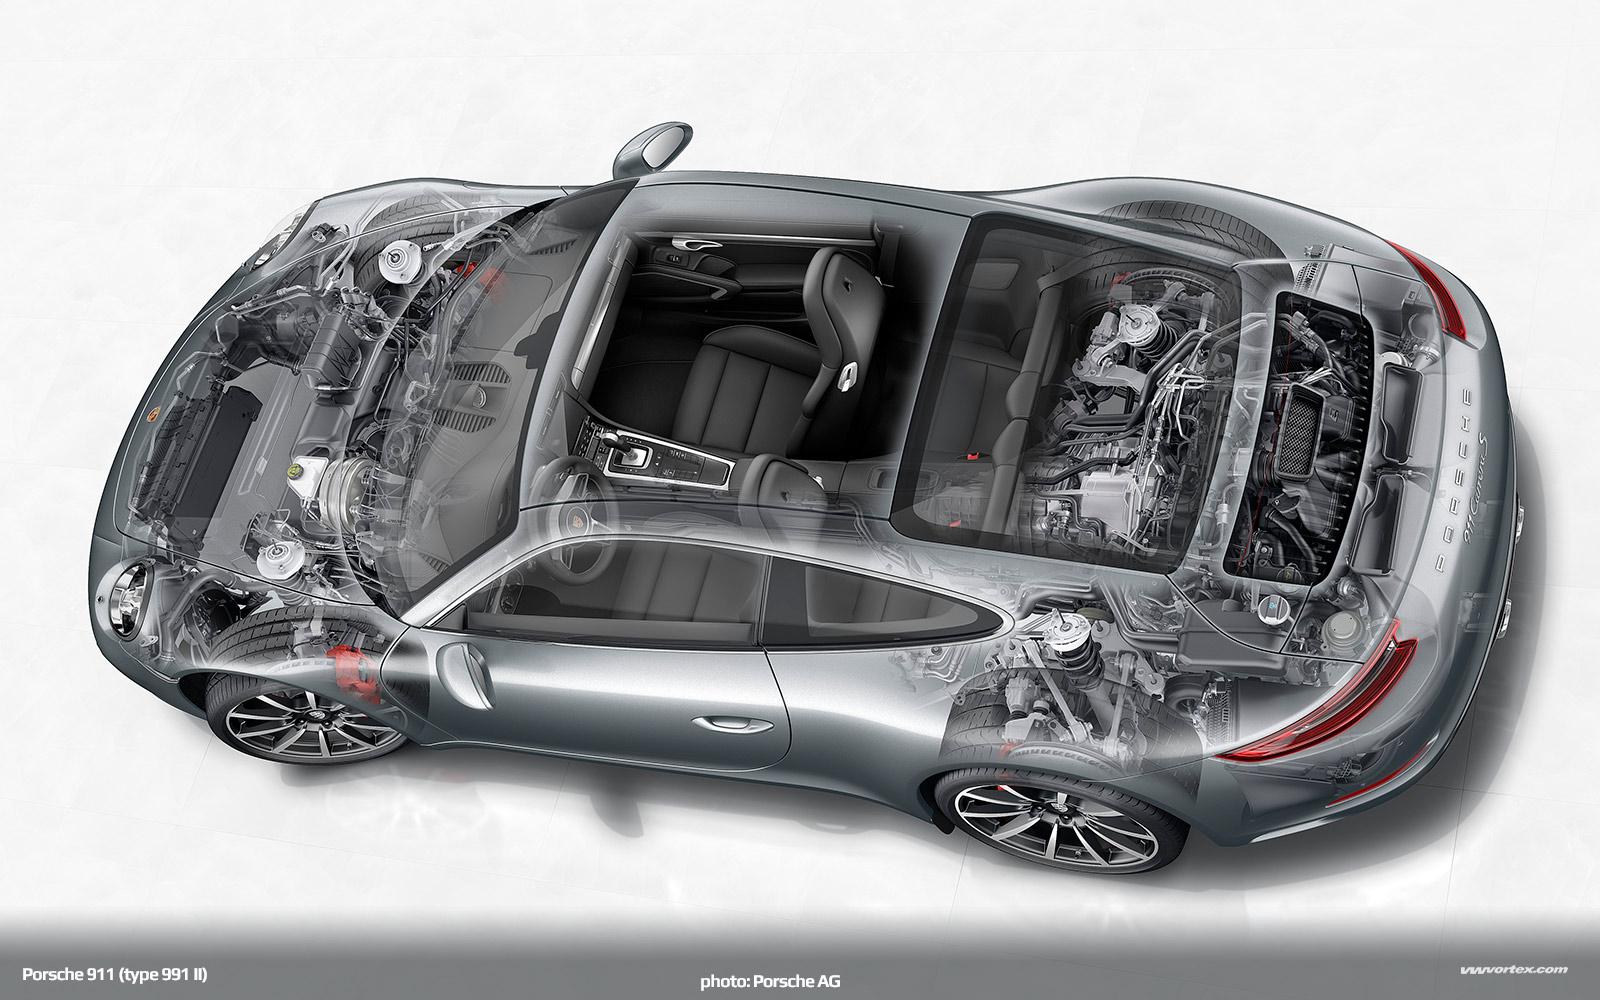 Porsche-911-991-ii-2016-497